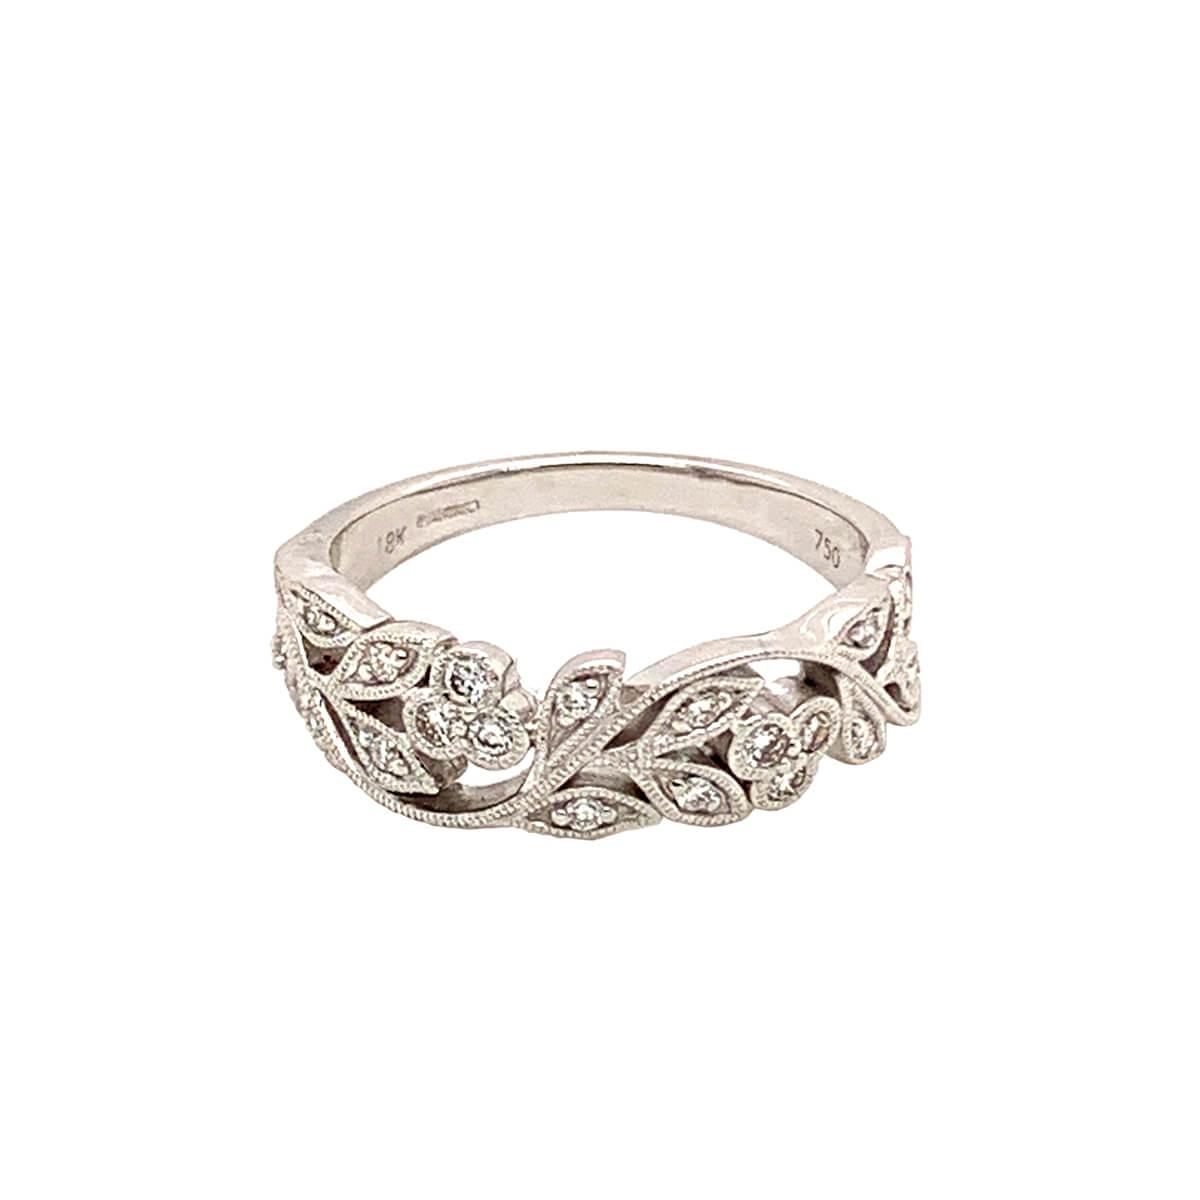 Leaf Design 18ct White Gold Diamond Ring